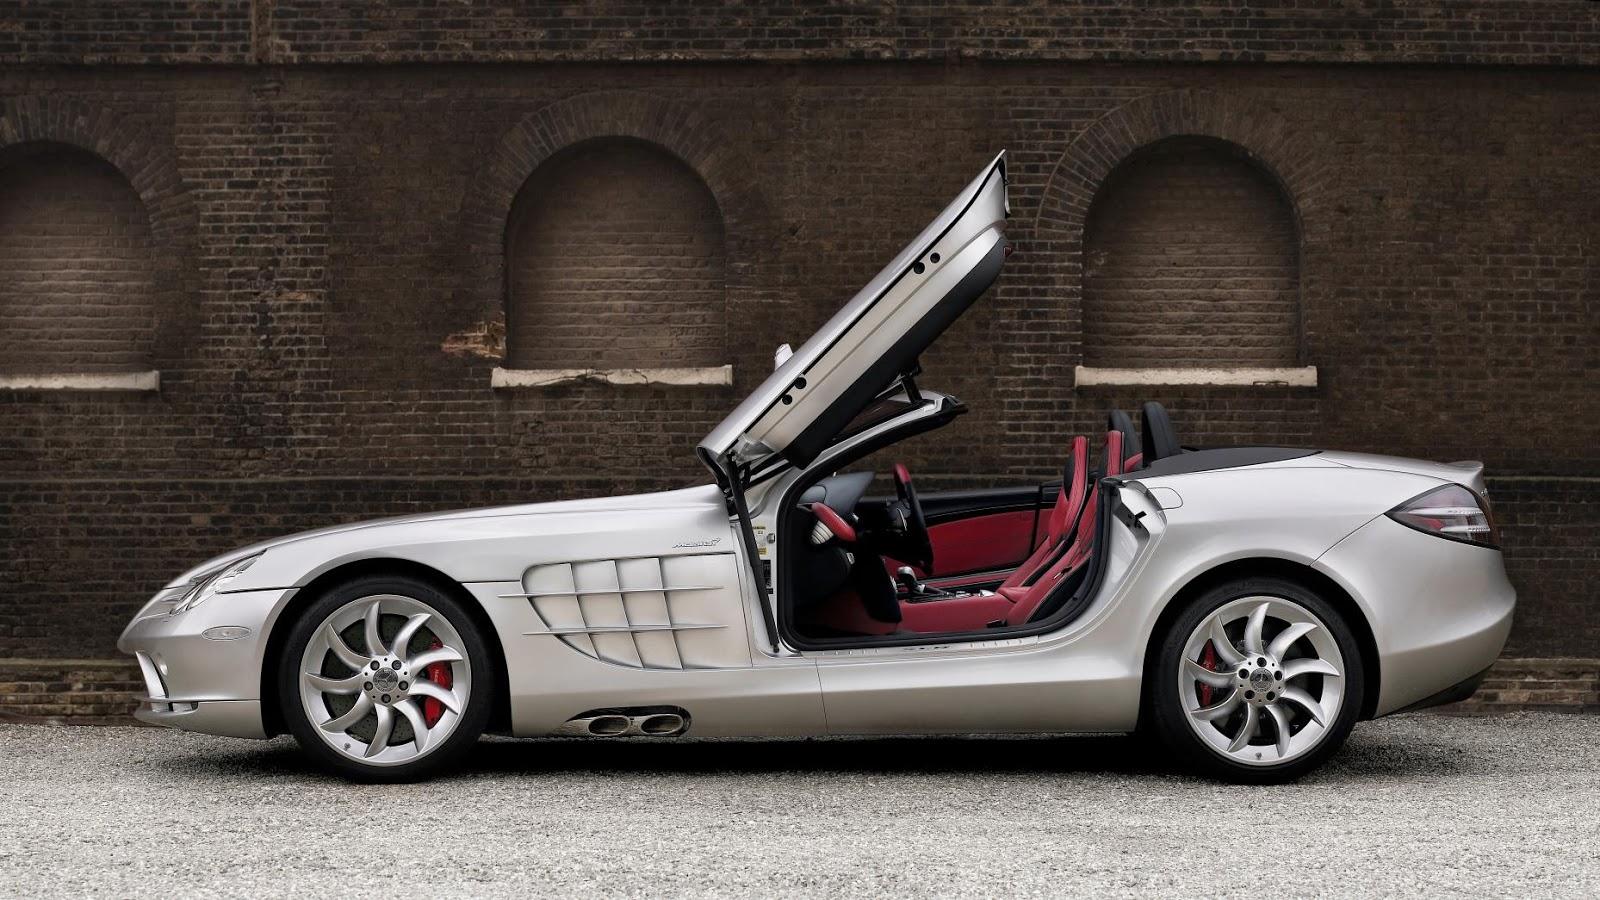 8. McLaren Mercedes SLR Roadster